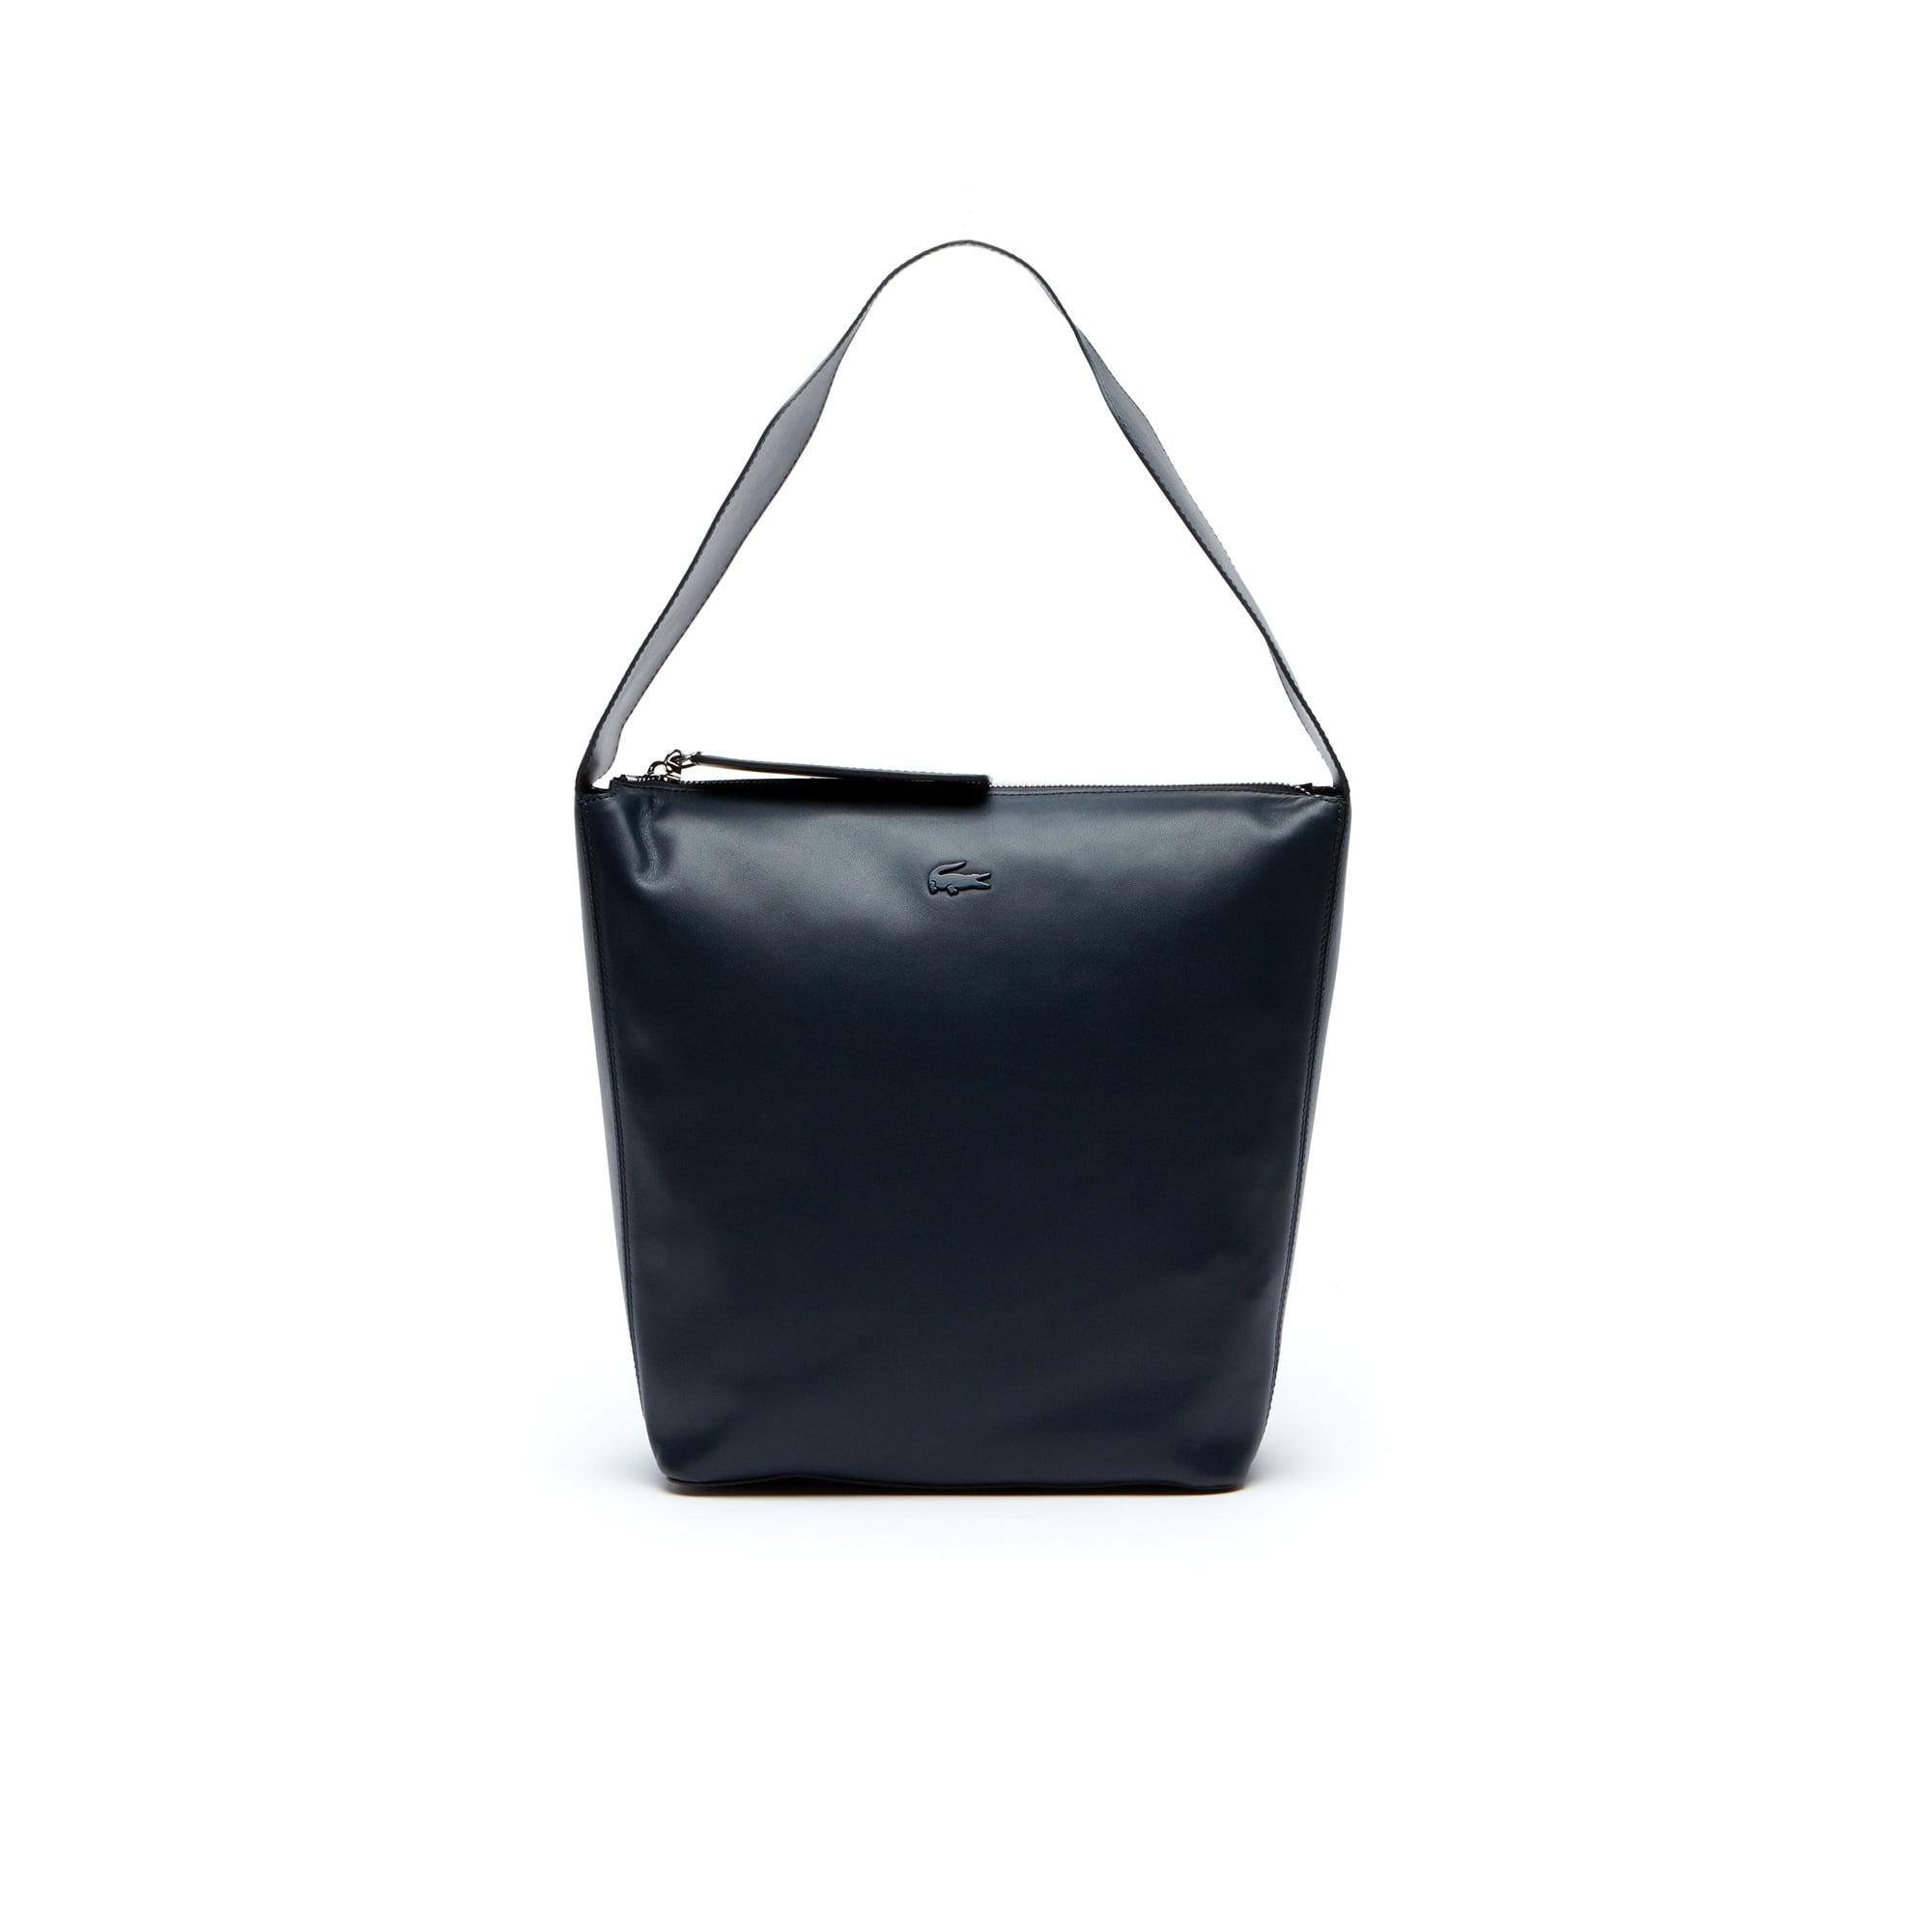 Women's Purity Soft Monochrome Leather Hobo Bag